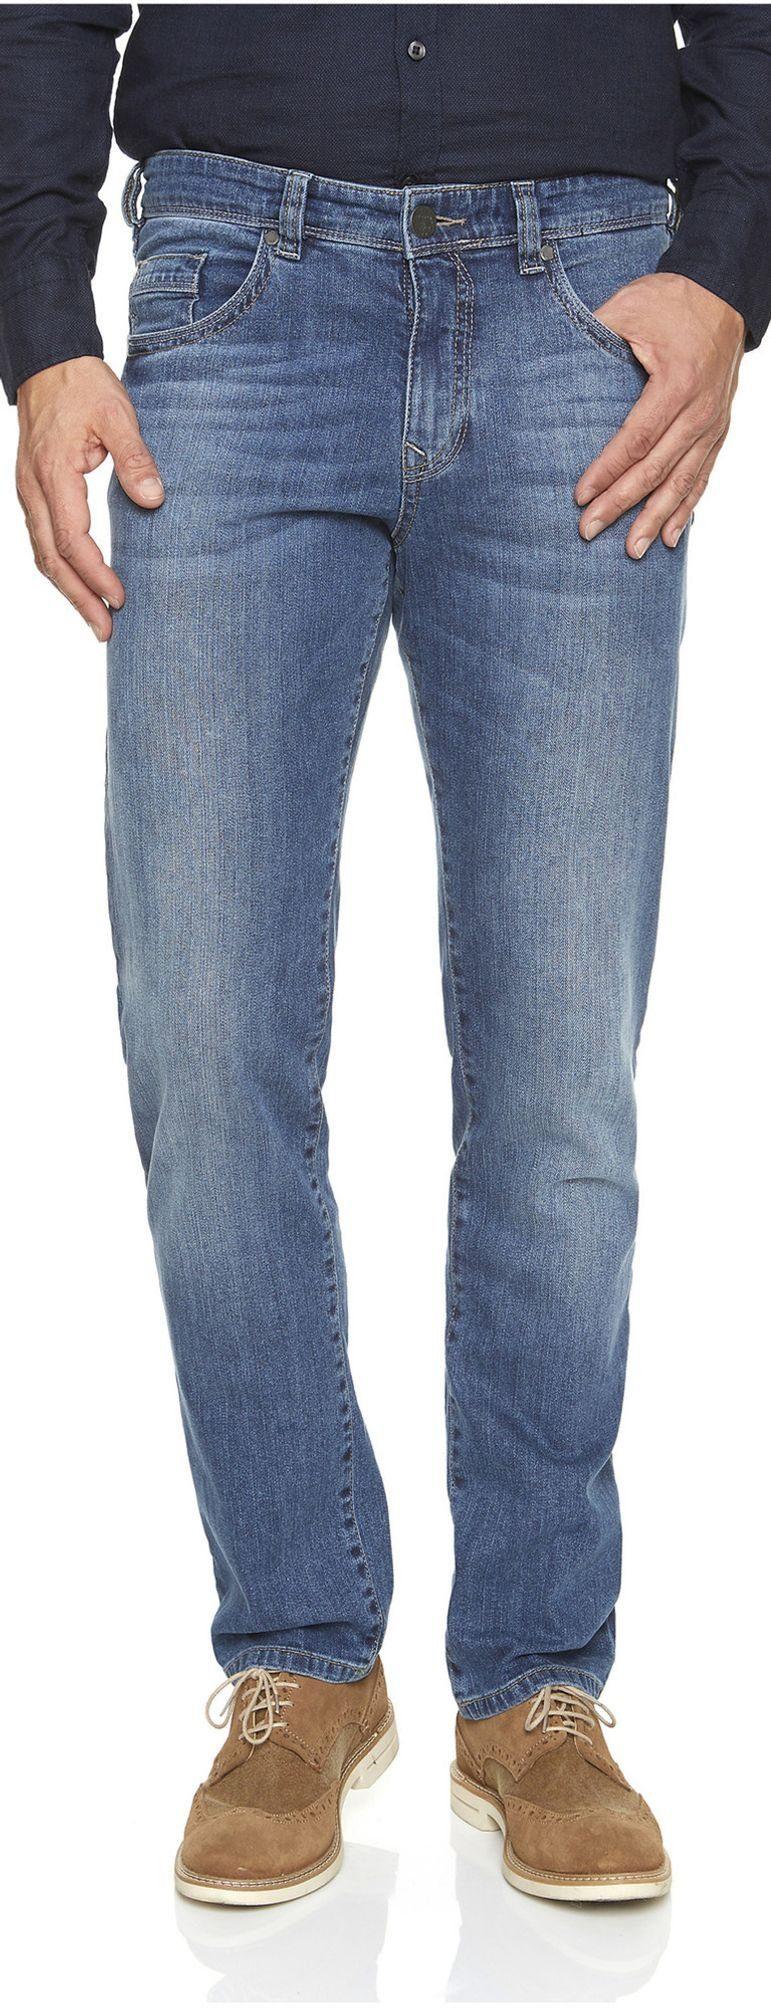 40 RAPHAELA by BRAX  Rosa Jeans Dynamic Gr.38 44  Regular terracotta  NEU